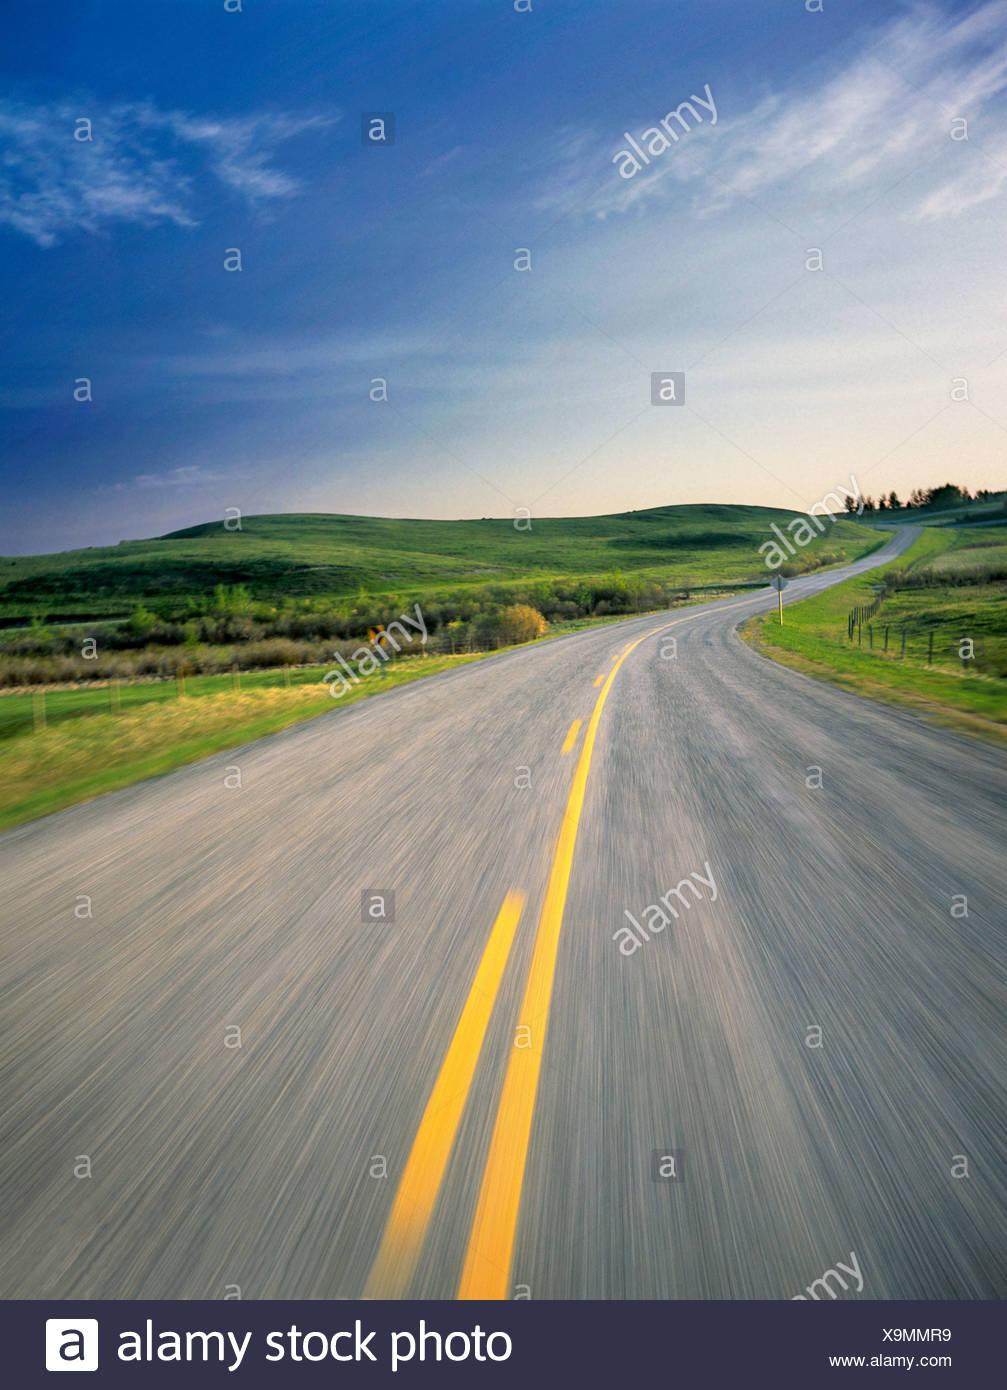 Road through pastureland near Cochrane, Alberta, Canada. - Stock Image